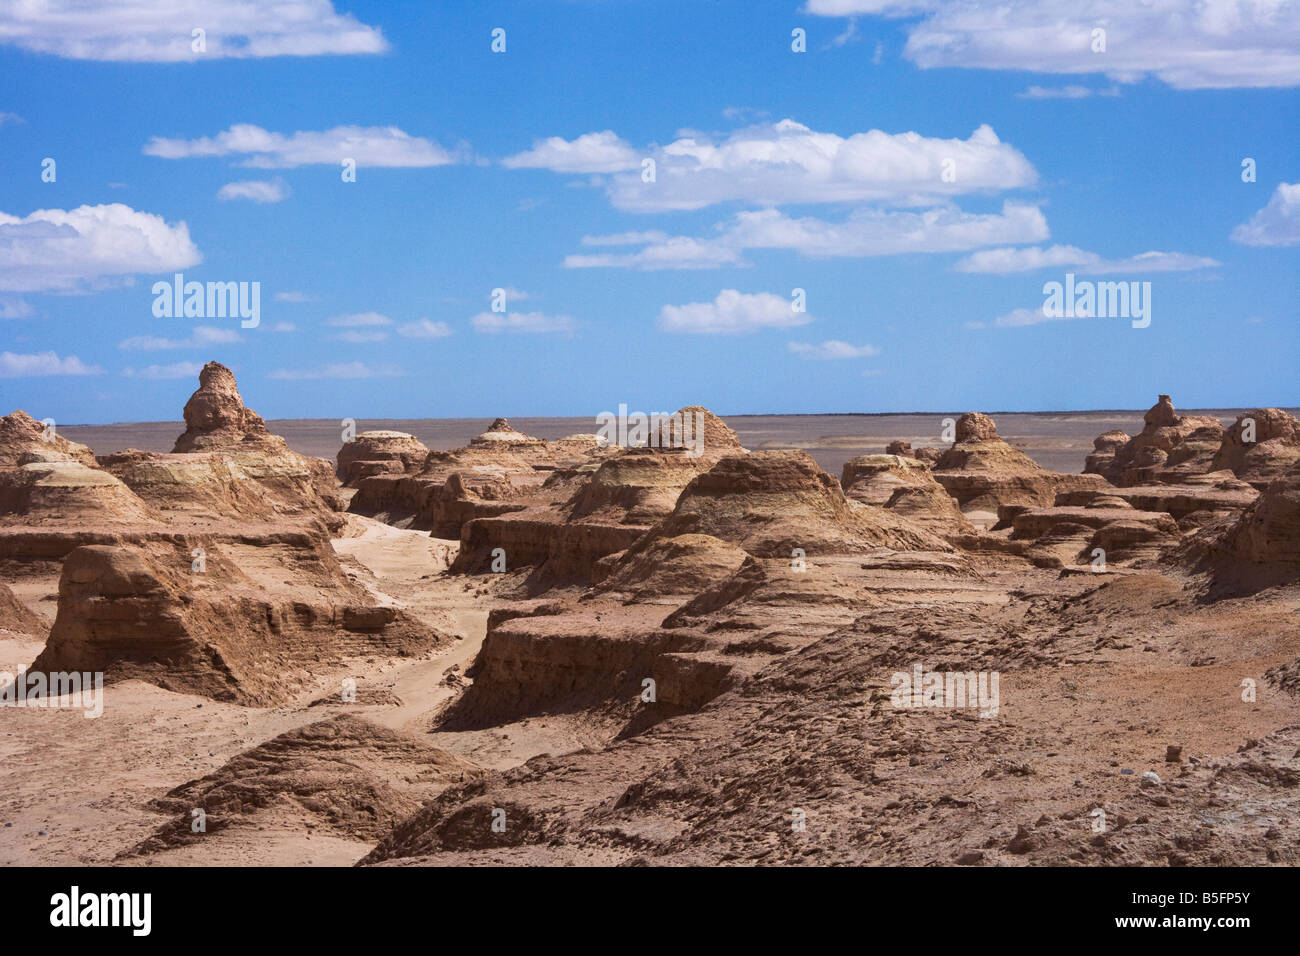 Monster City Bailongdui Yadan Geographie in der Wüste Yumenguan Gansu Provinz China Stockbild